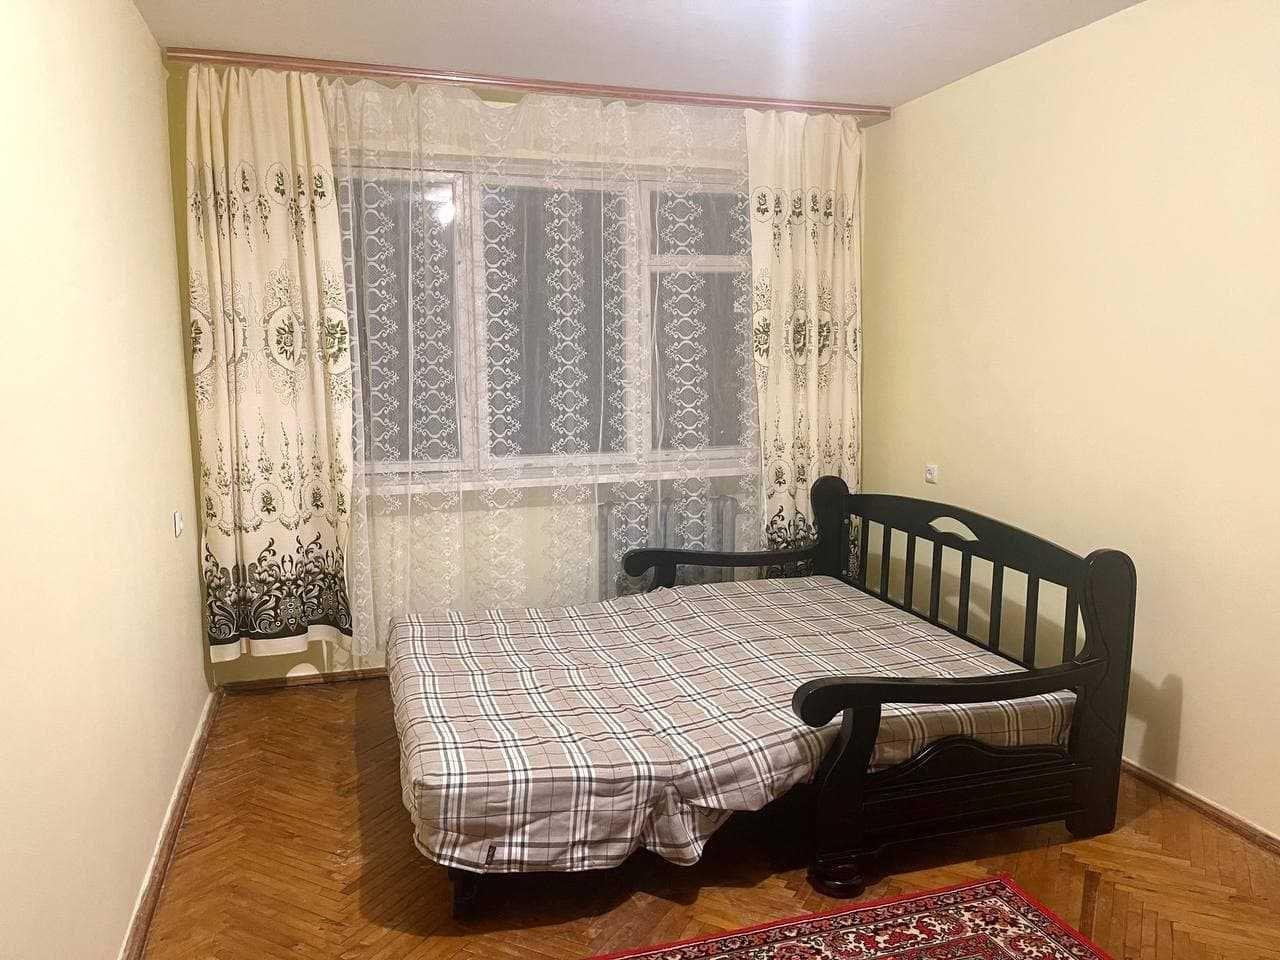 Продаж 3 кім квартири 59.3 кв.м. вул.В.Великого